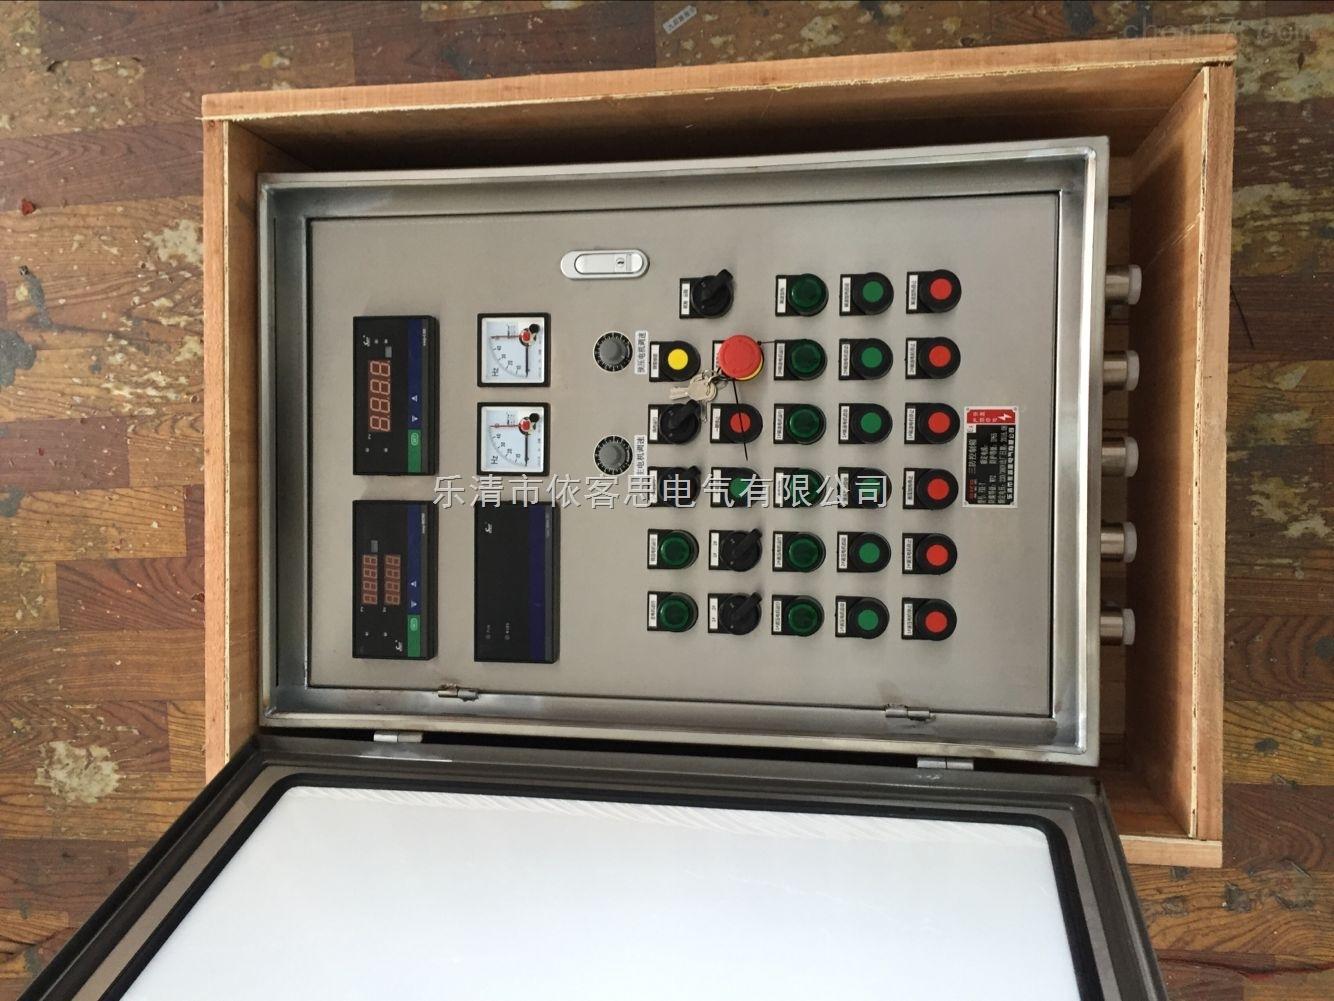 FXK-S三防控制箱不锈钢防水防尘防腐按钮操作箱厂家生产